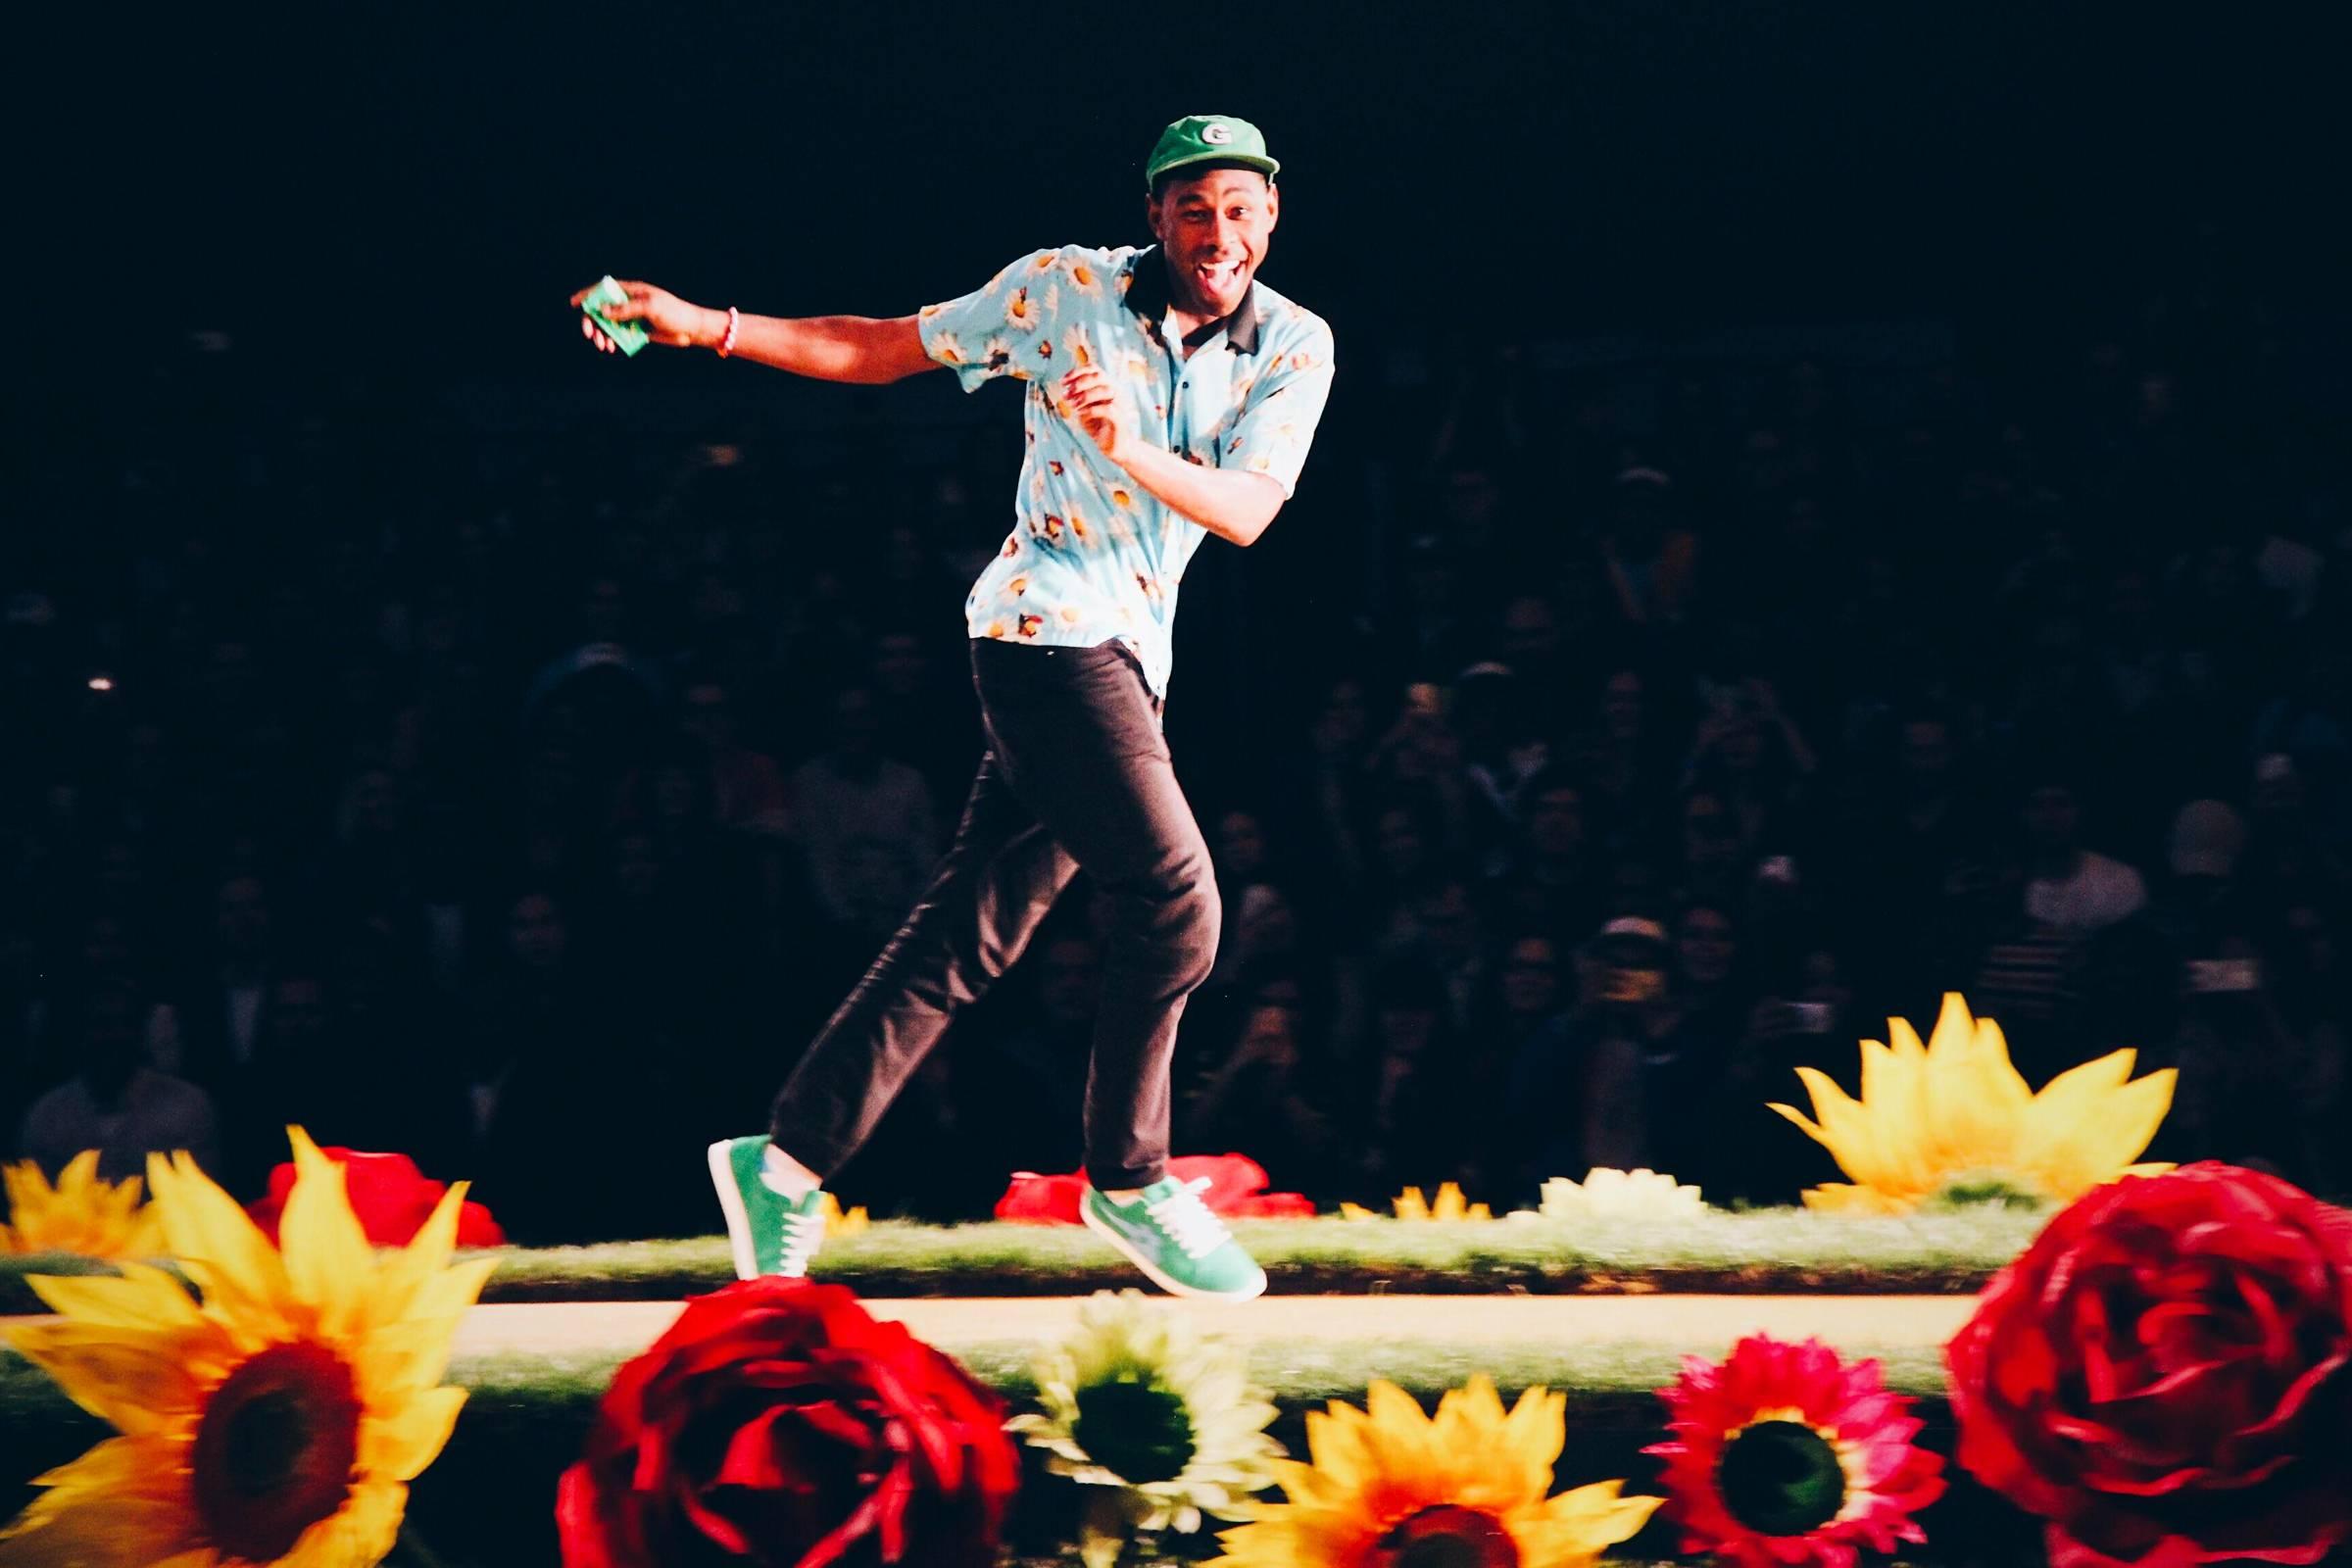 Tyler, The Creator following the debut Golf Wang fashion show wearing Golf Le Fleur* sneakers (2016).